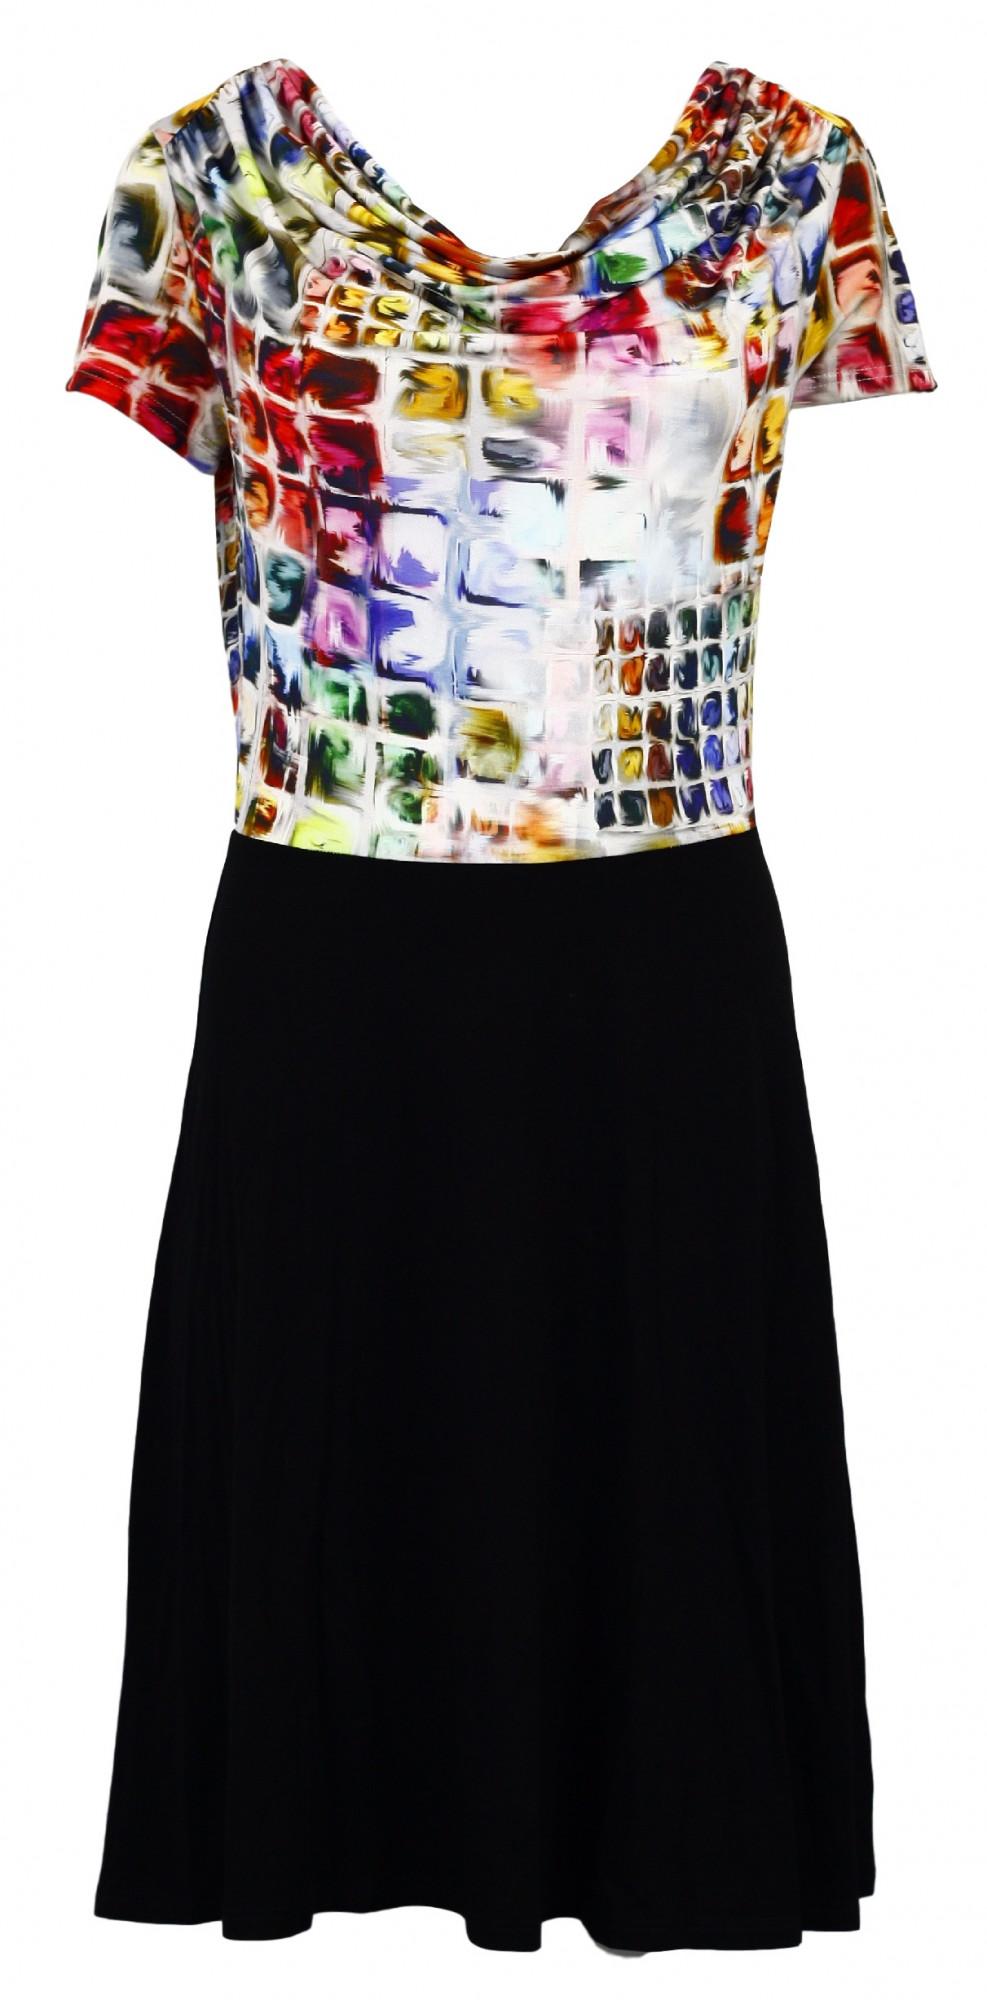 Šaty Mozaika Vodaka - Favab Barva: originál, Velikost: S